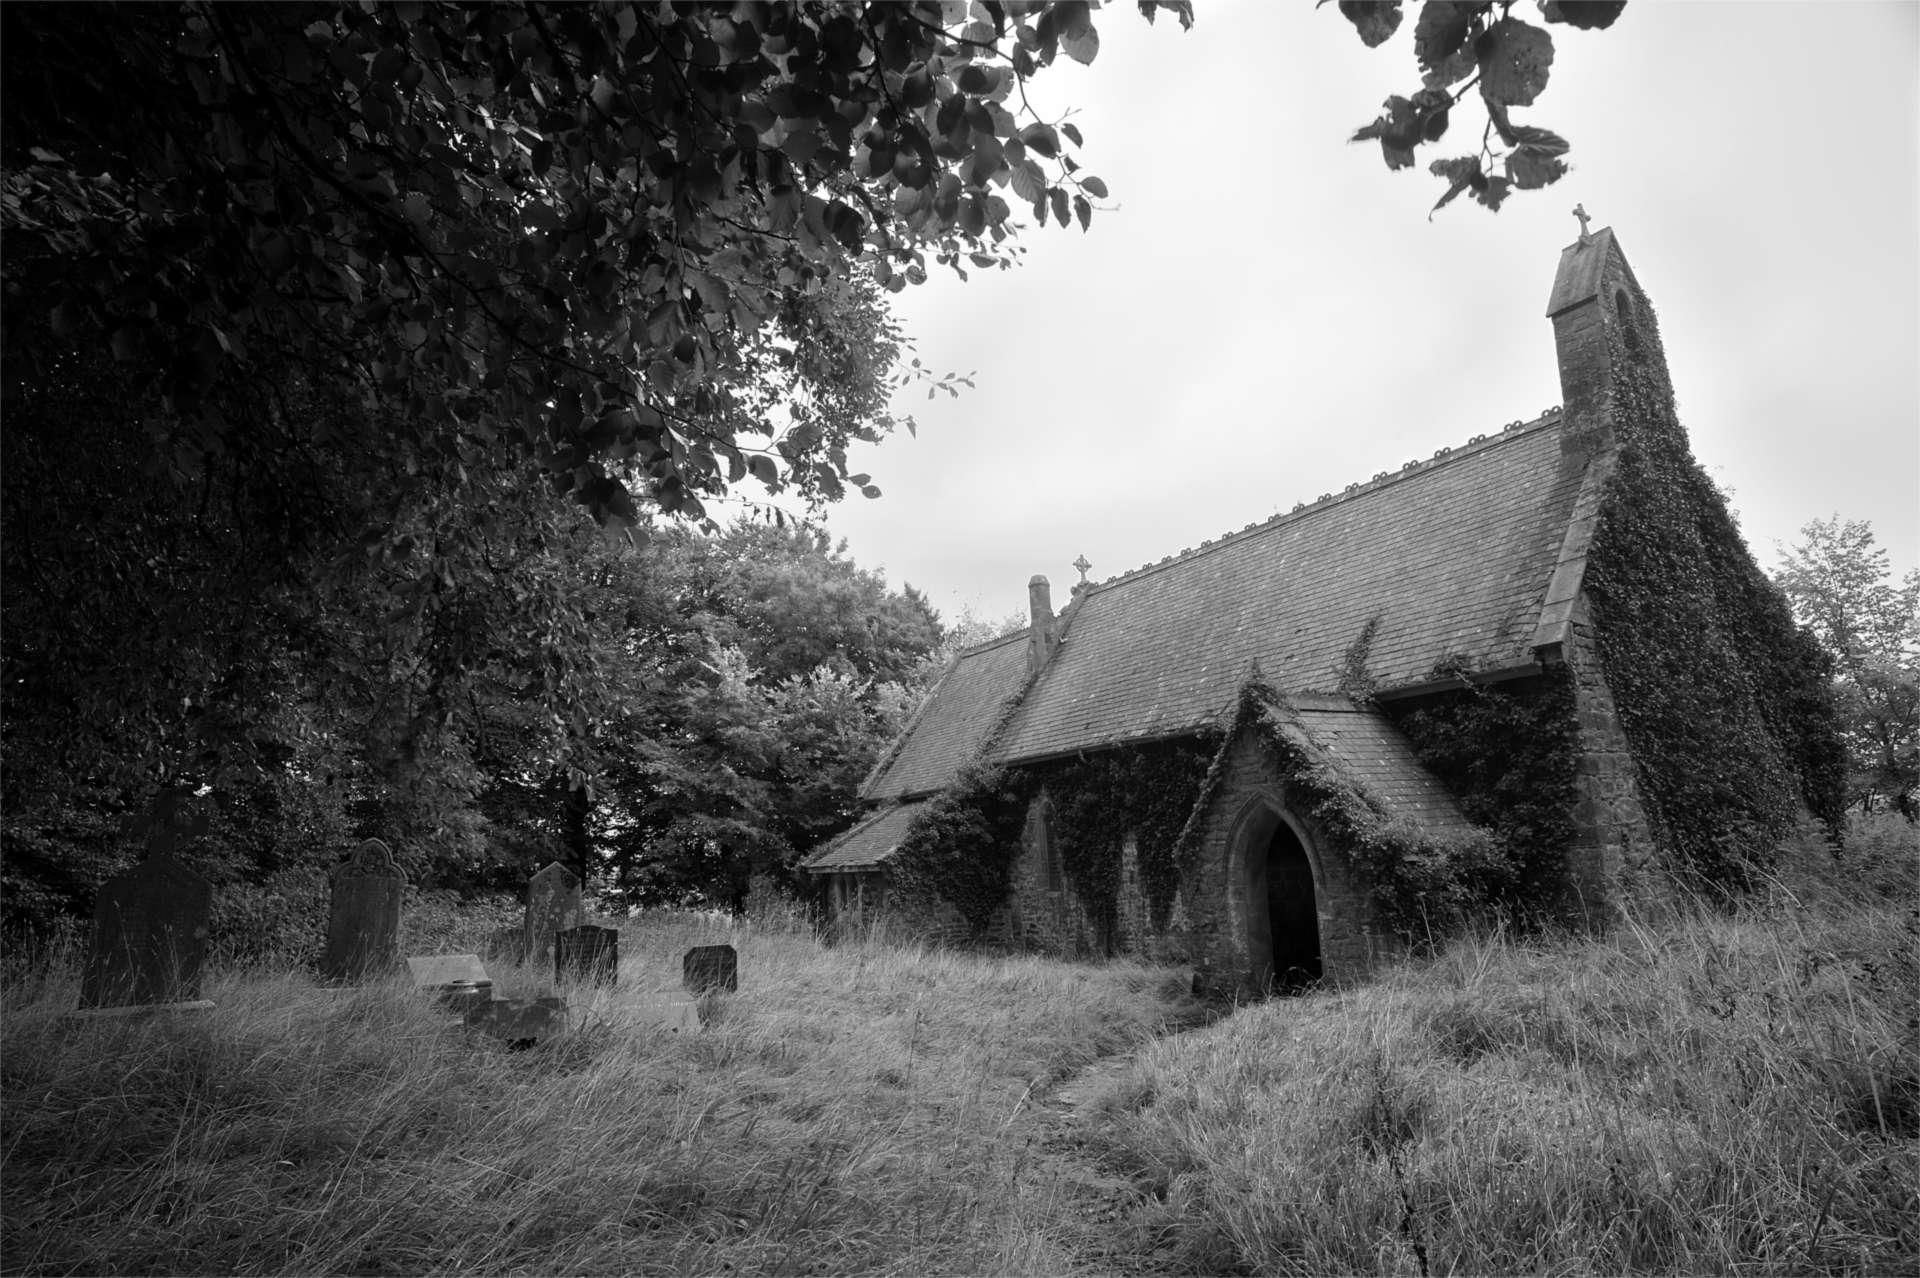 Eglwys Sant Canna